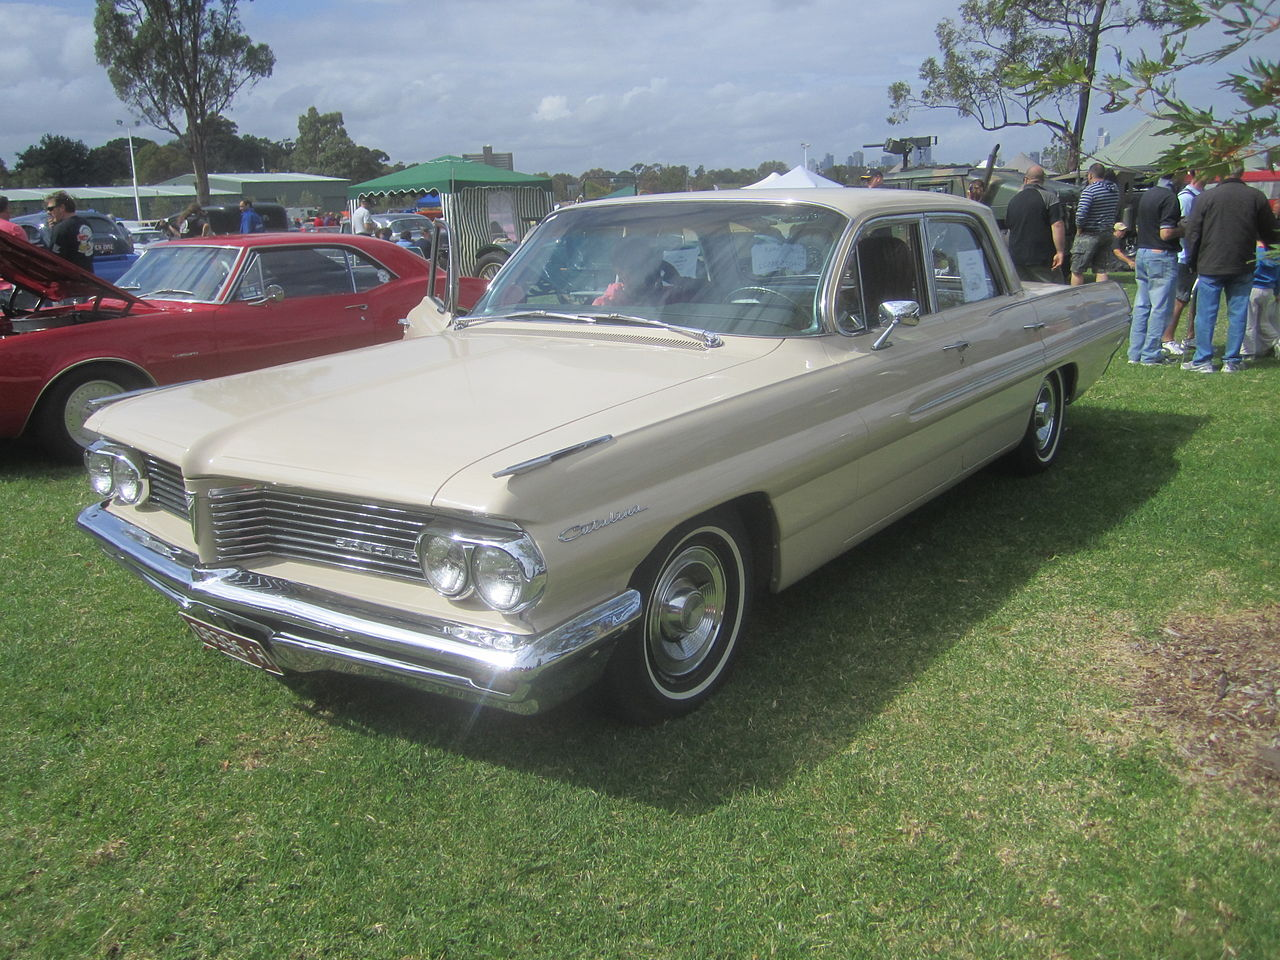 File:1962 Pontiac Catalina Sedan.jpg - Wikimedia Commons